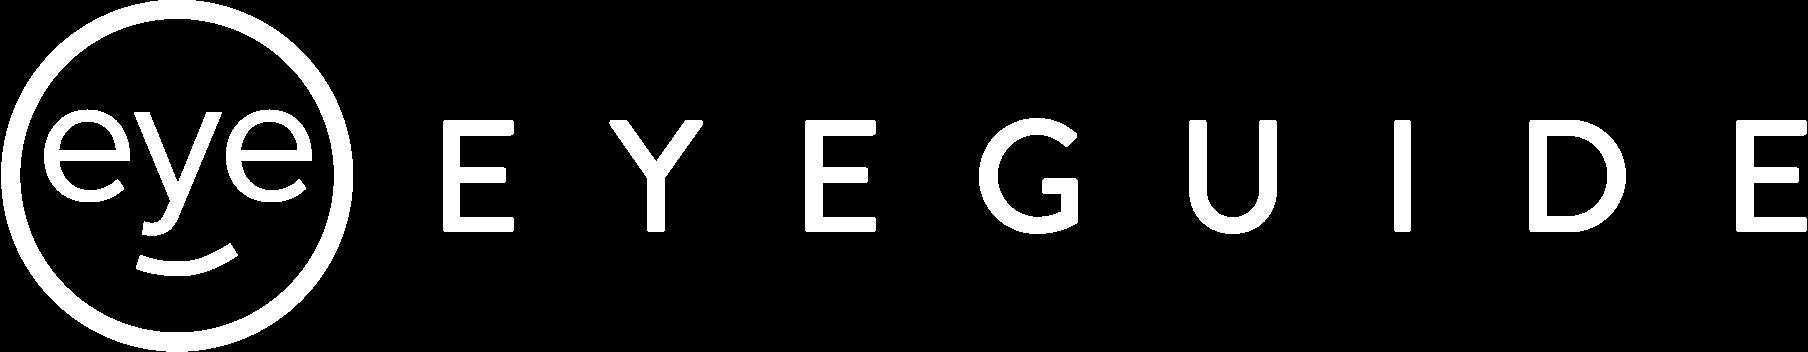 EyeGuide logo